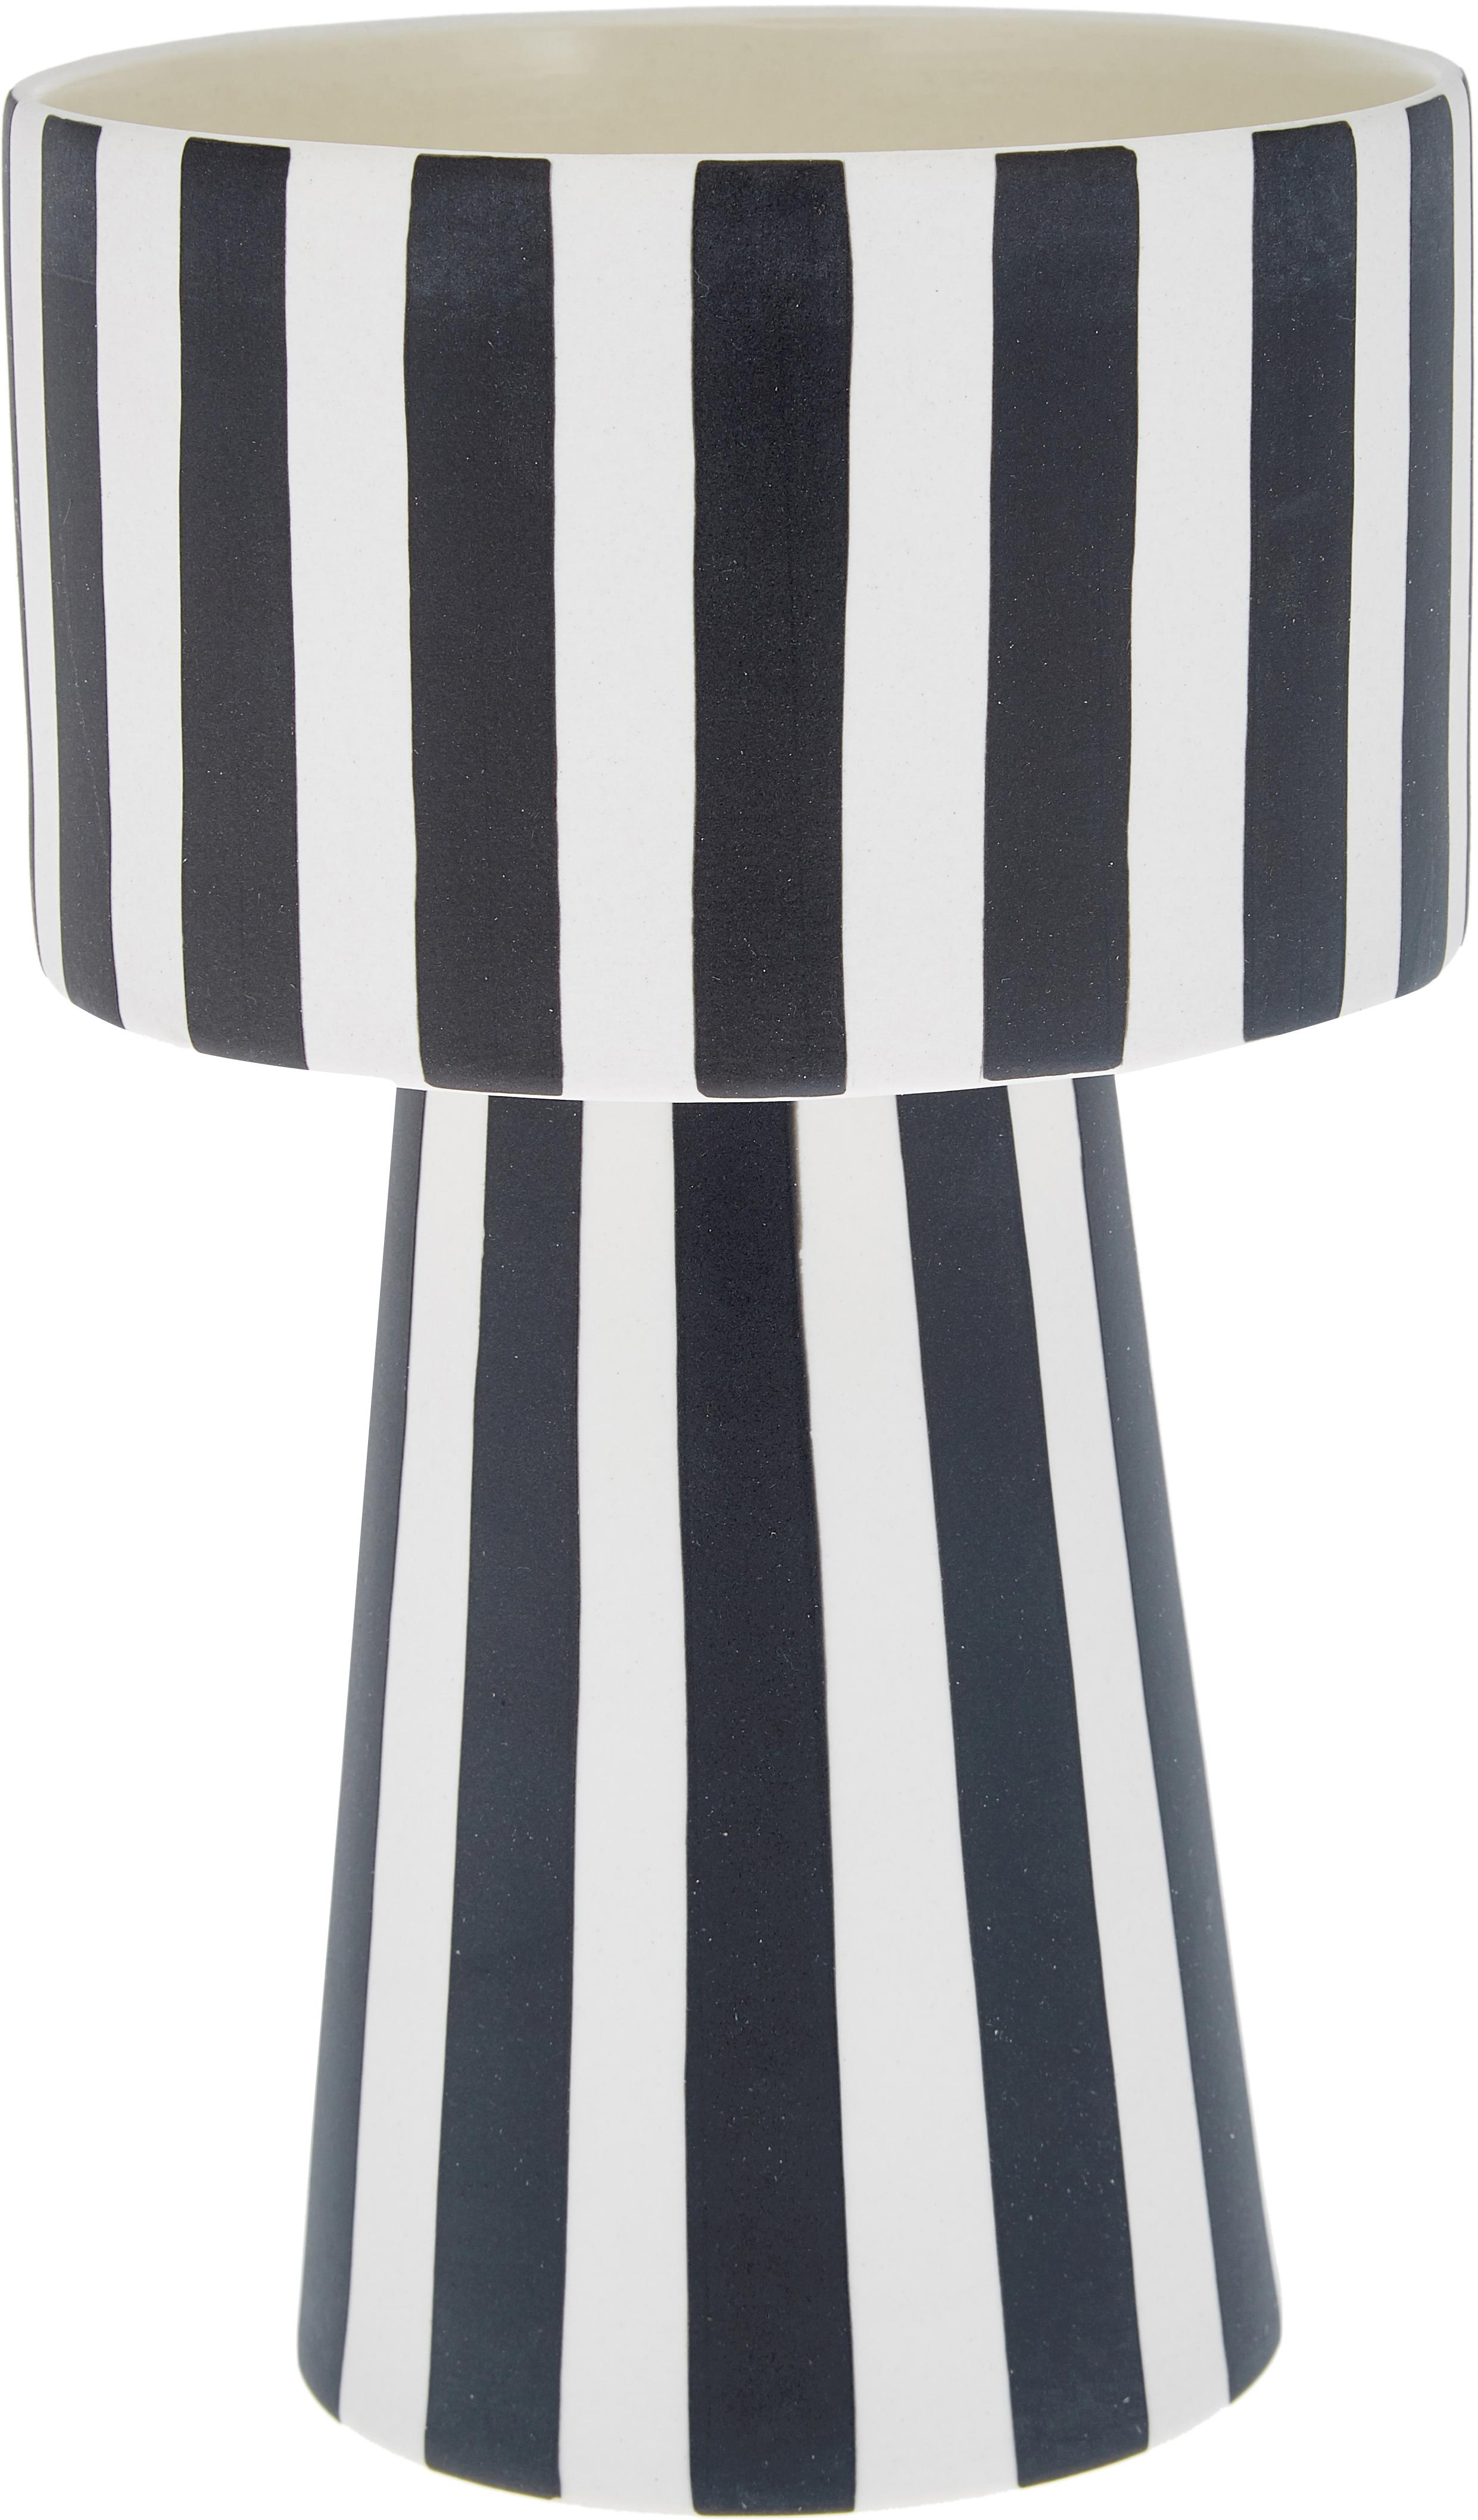 Handgefertigter Übertopf Toppu, Keramik, Weiß, Schwarz, Ø 15 x H 24 cm